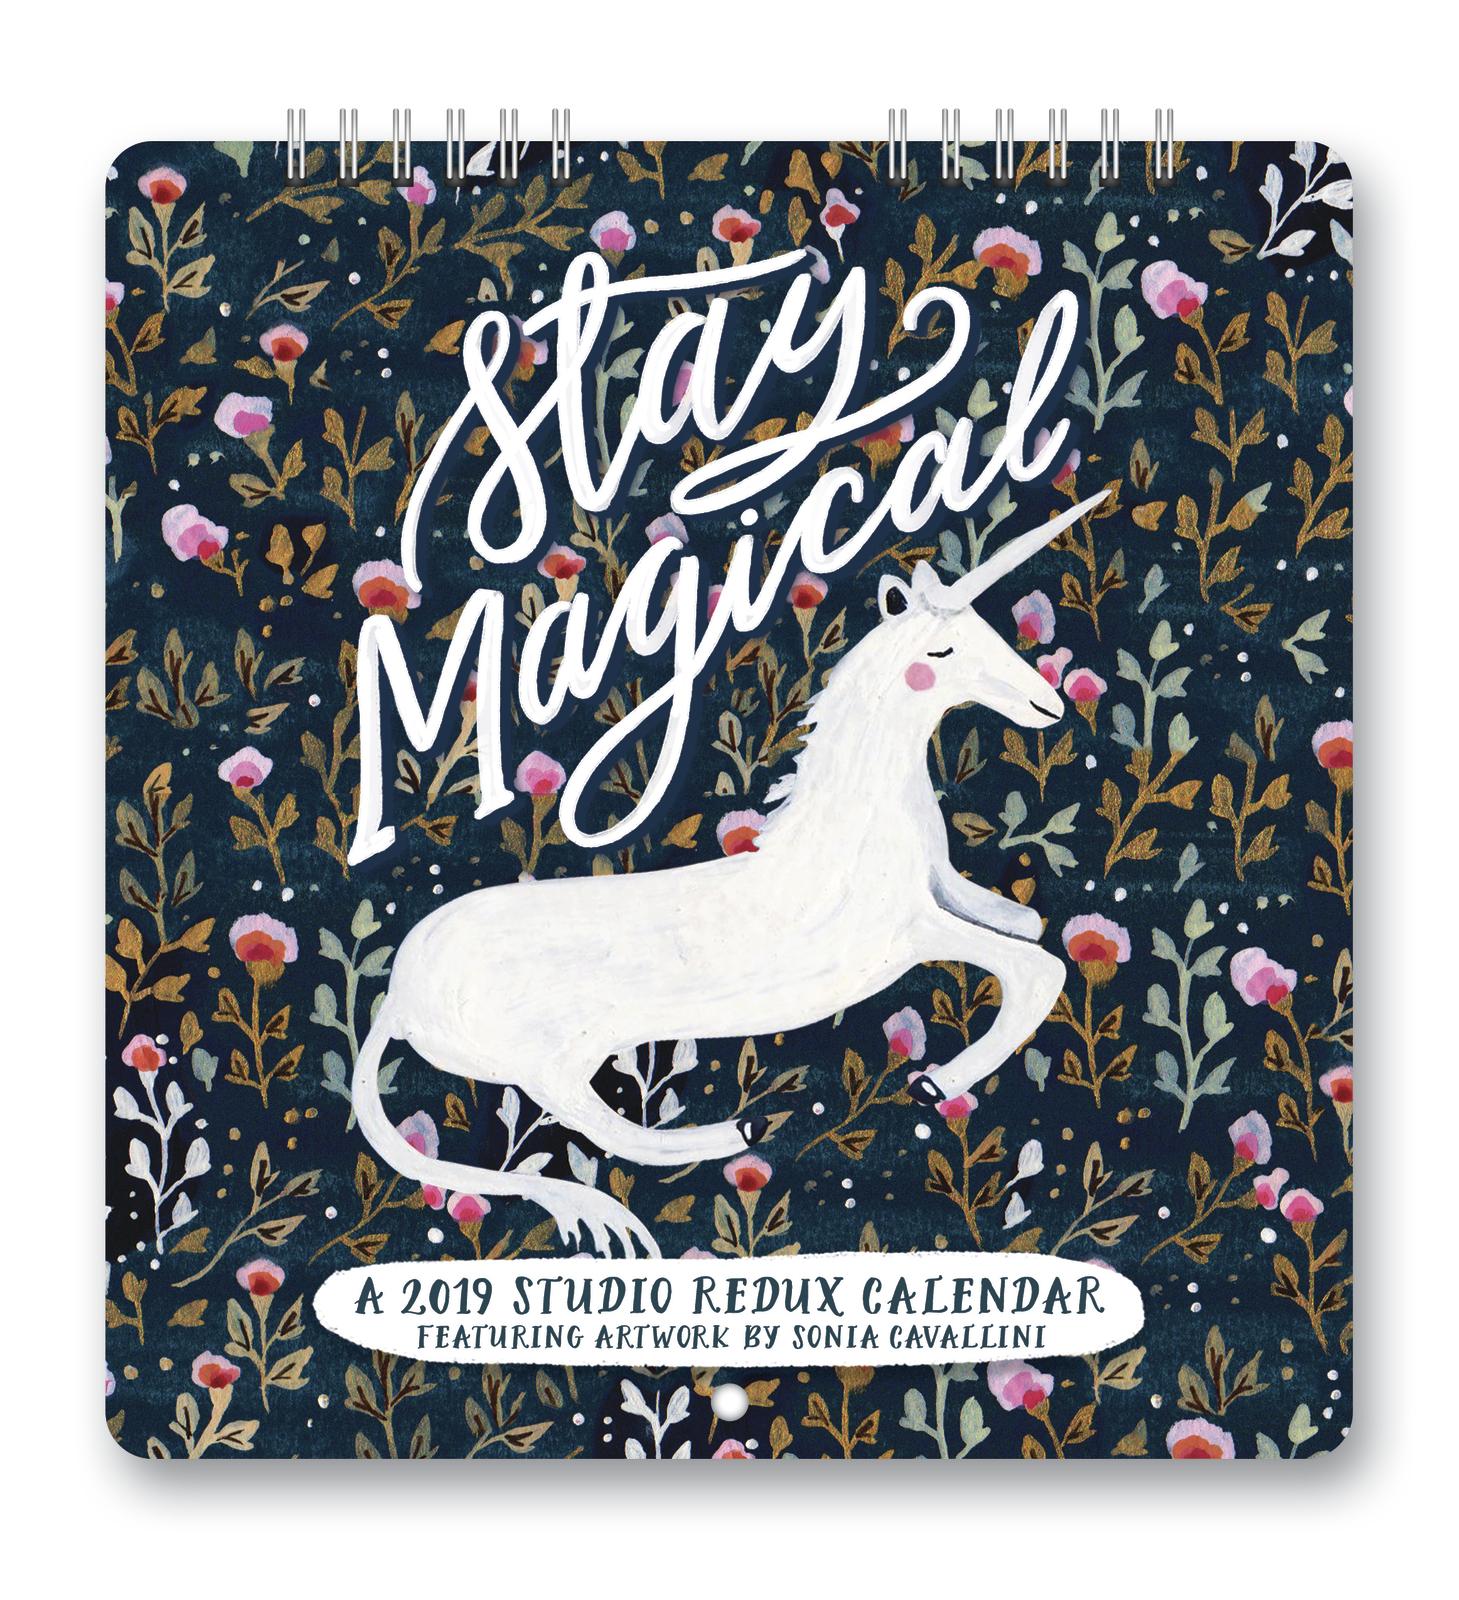 Studio Redux: Stay Magical 2019 Mini Wall Calendar image